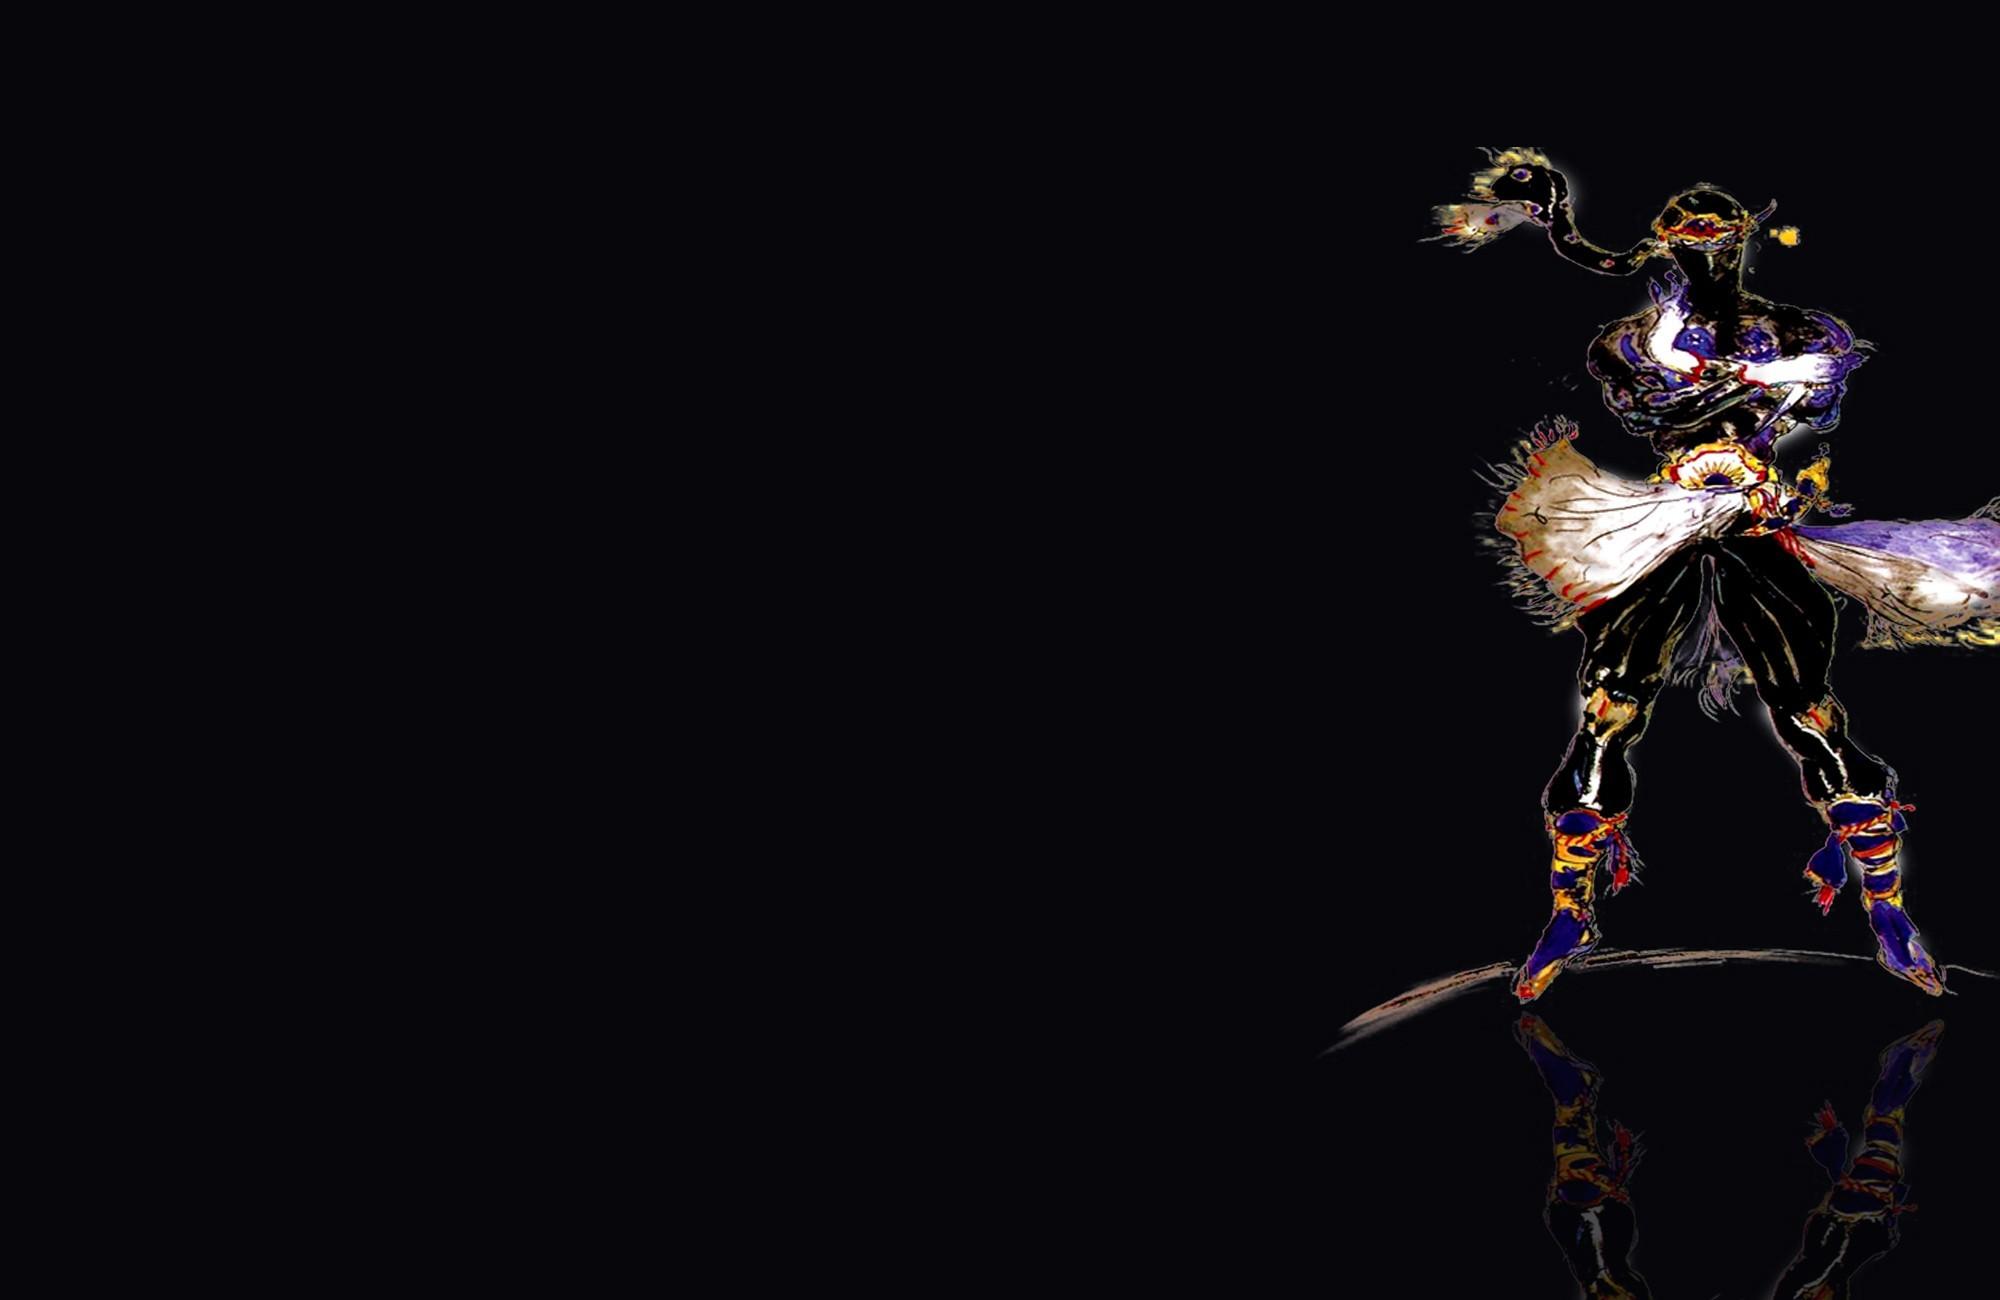 final fantasy vi shadow six ff6 blackhound HD Wallpaper